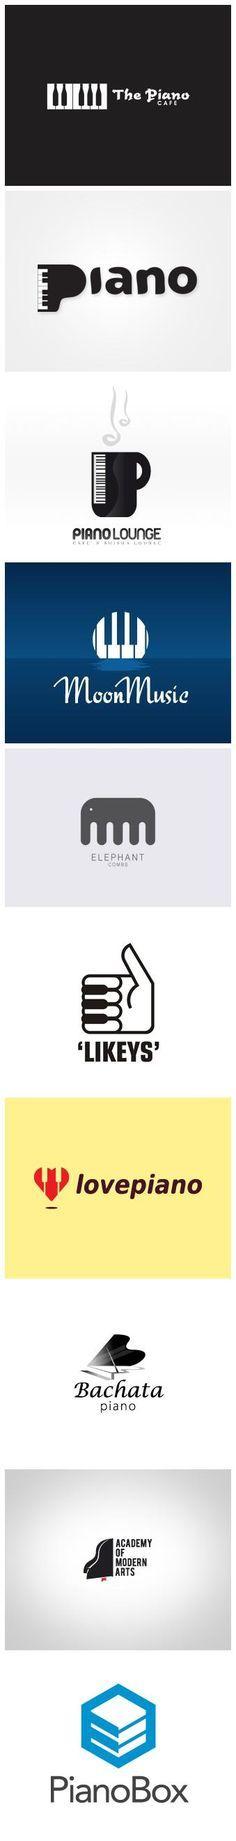 Creative Piano Logos For Inspiration